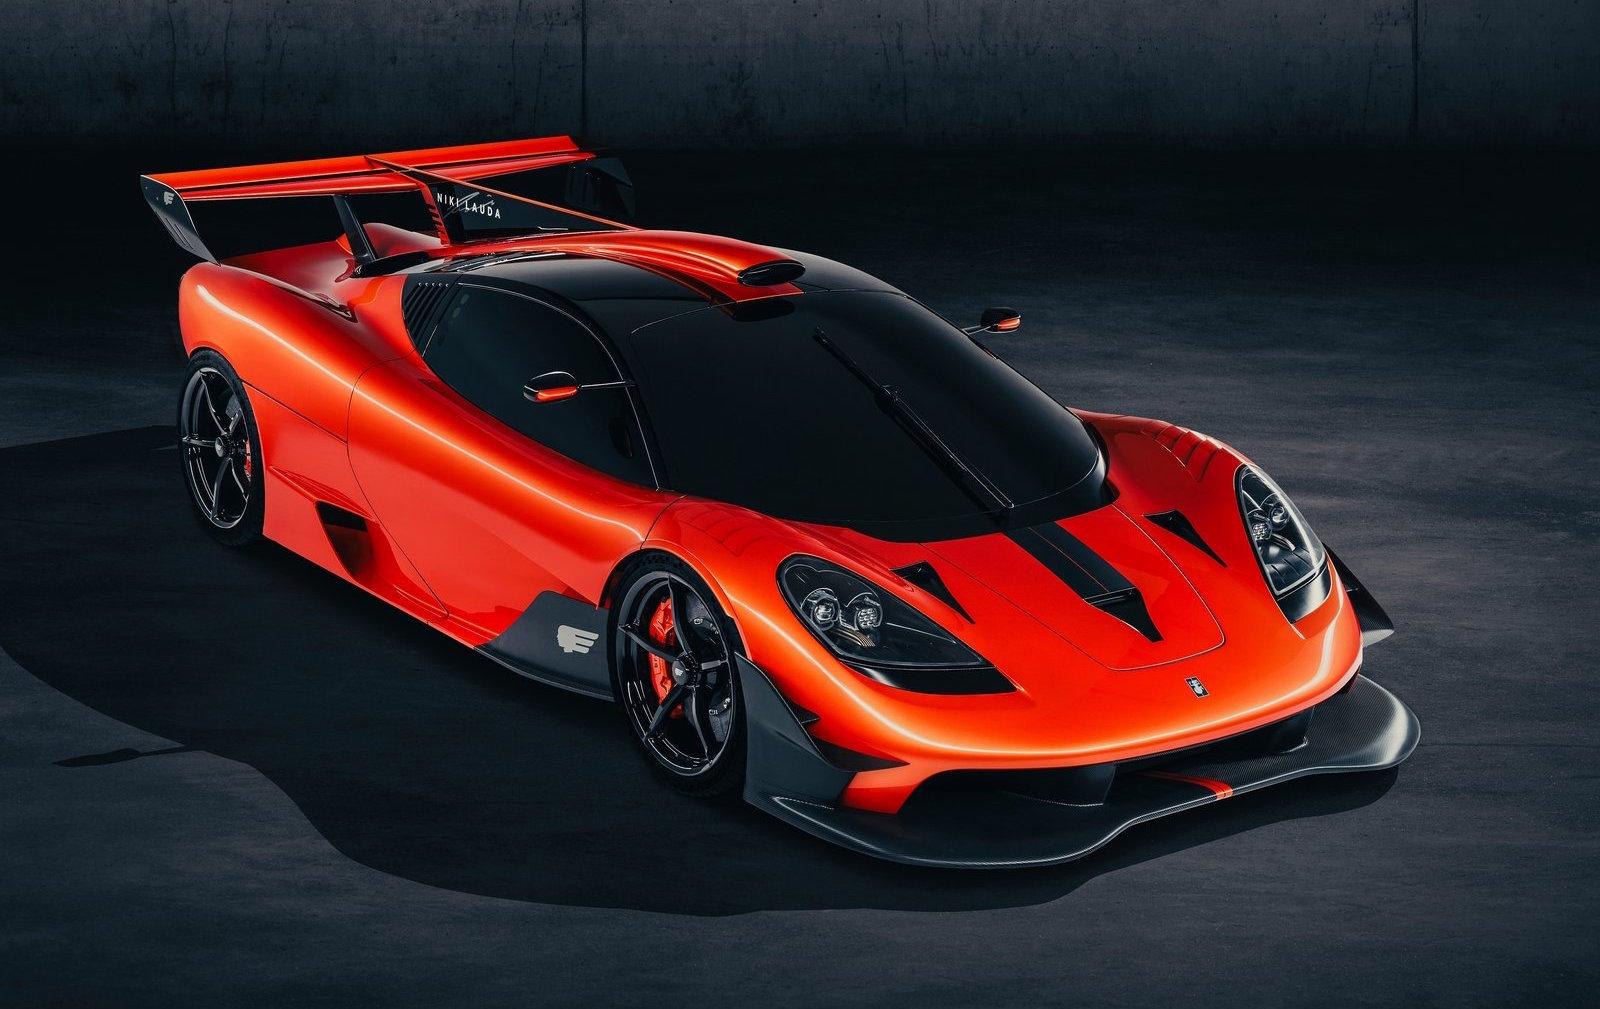 Gordon Murray T.50 Niki Lauda track-ready edition revealed – PerformanceDrive